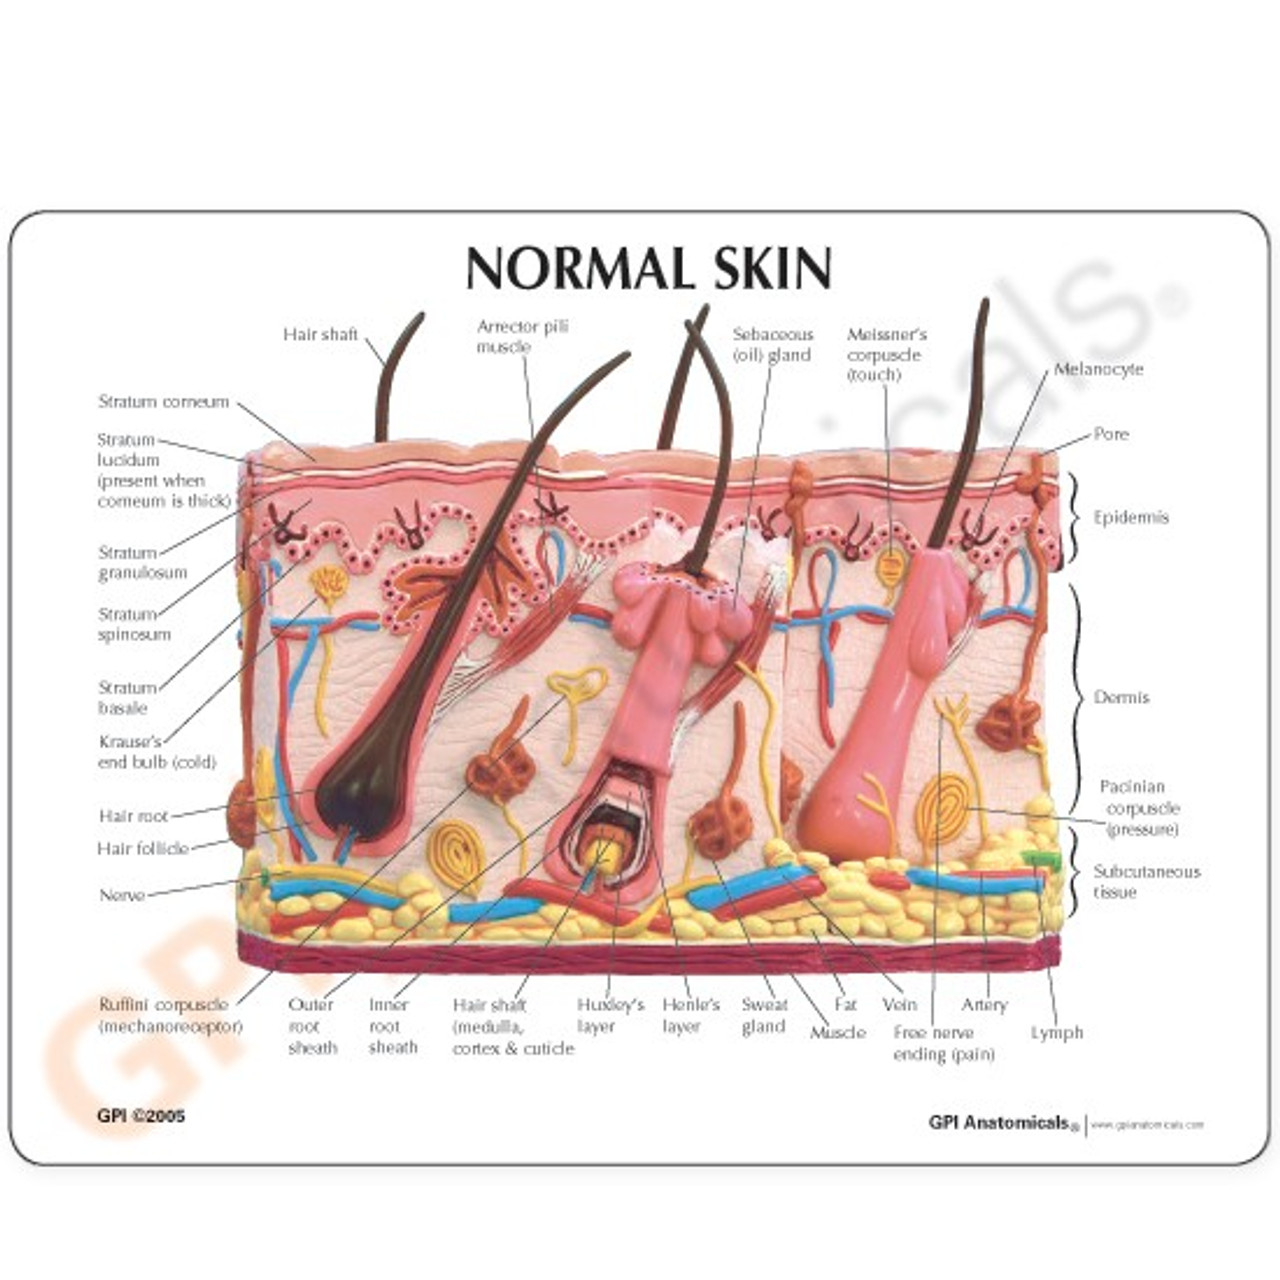 Skin Burn & Normal Skin Model Description Card